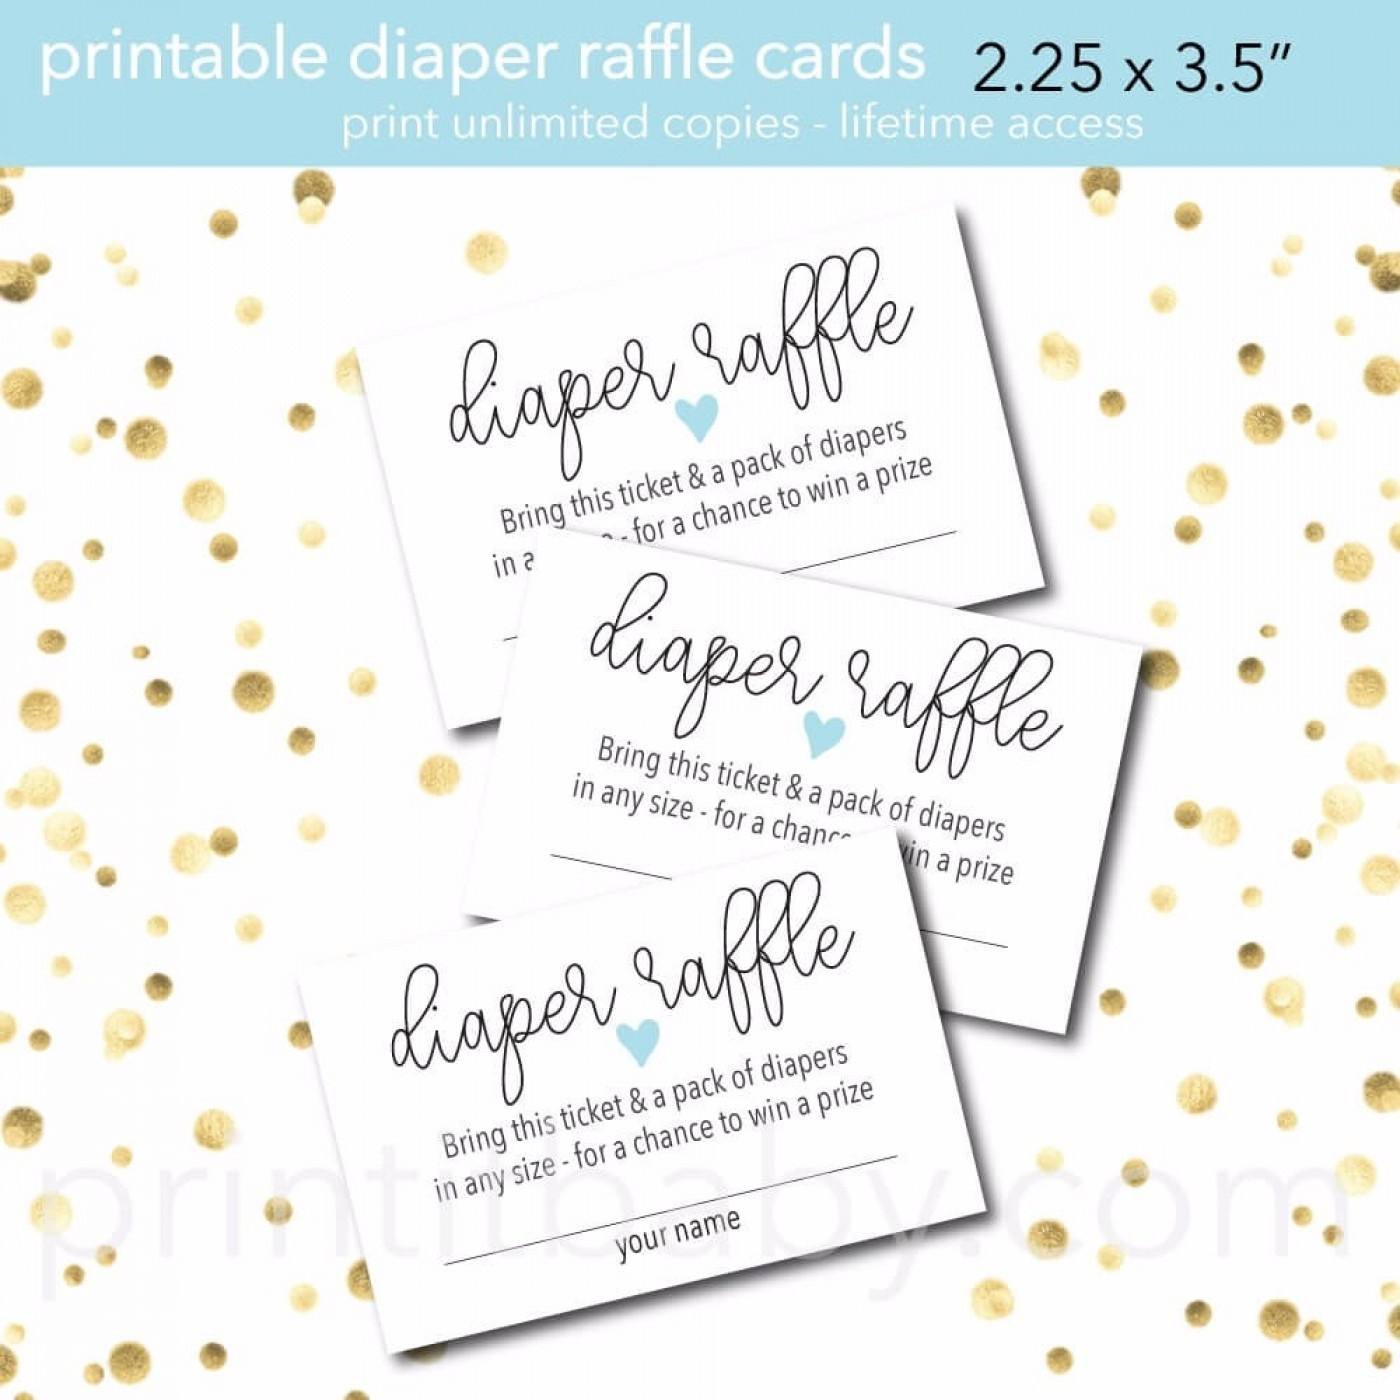 009 Diaper Raffle Tickets Template Ideas Rare Free Owl Ticket - Diaper Raffle Free Printable